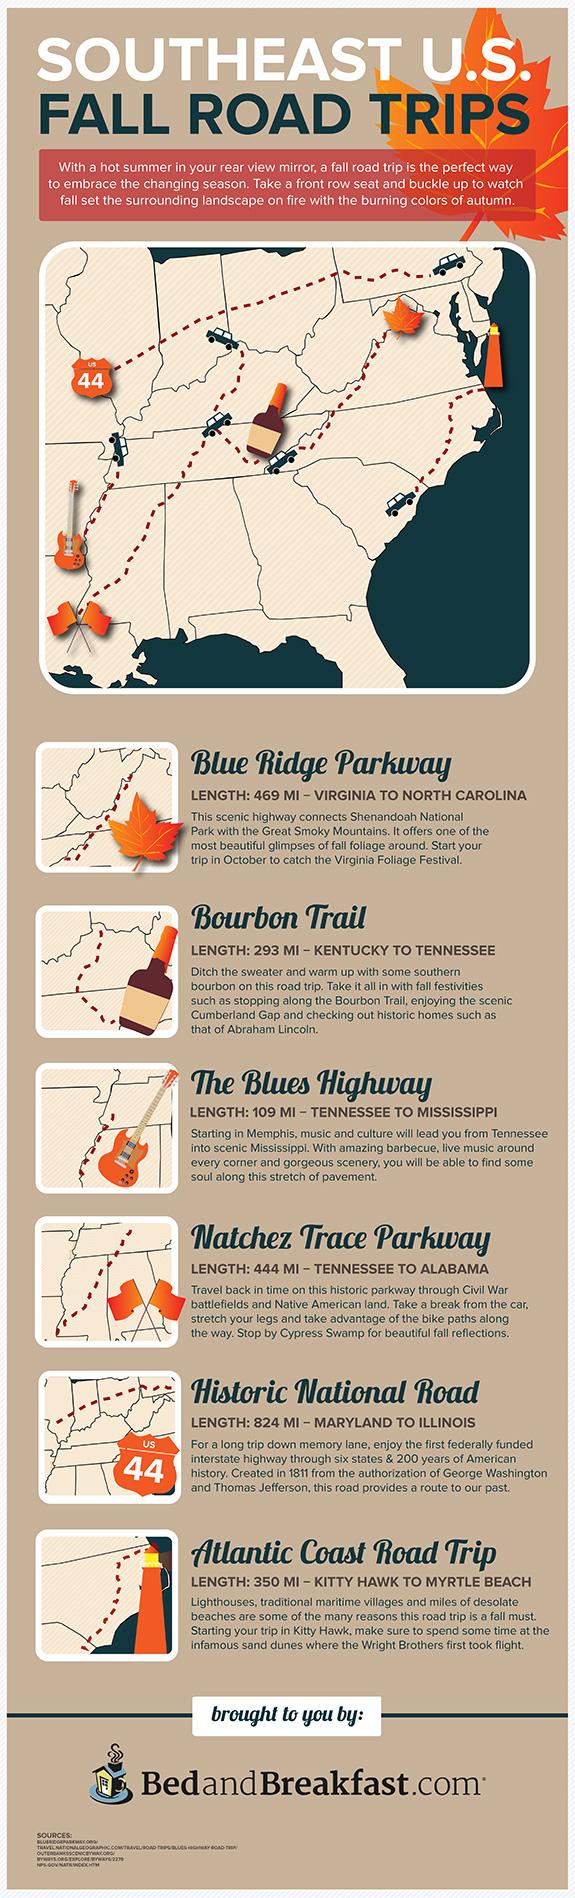 southeast-us-fall-roadtrips_5249e50c3bf6b